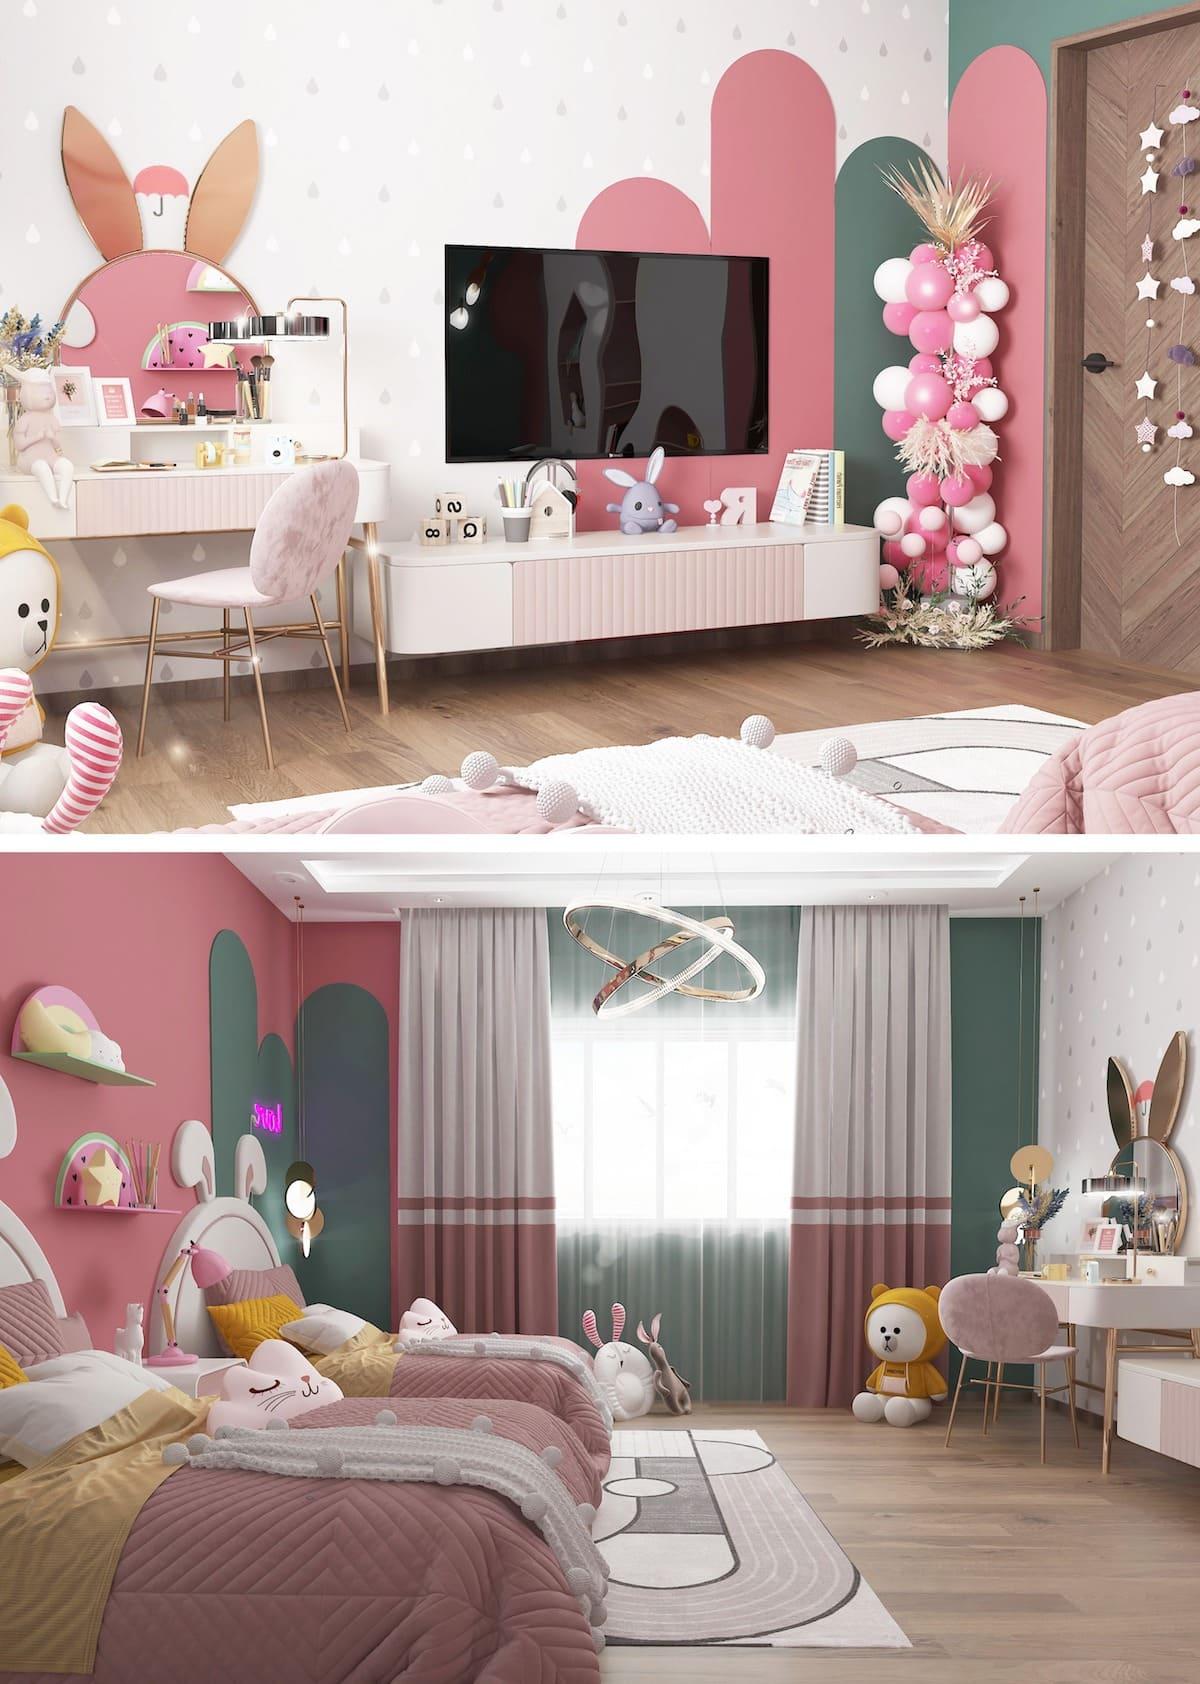 интерьер детской комнаты фото 25